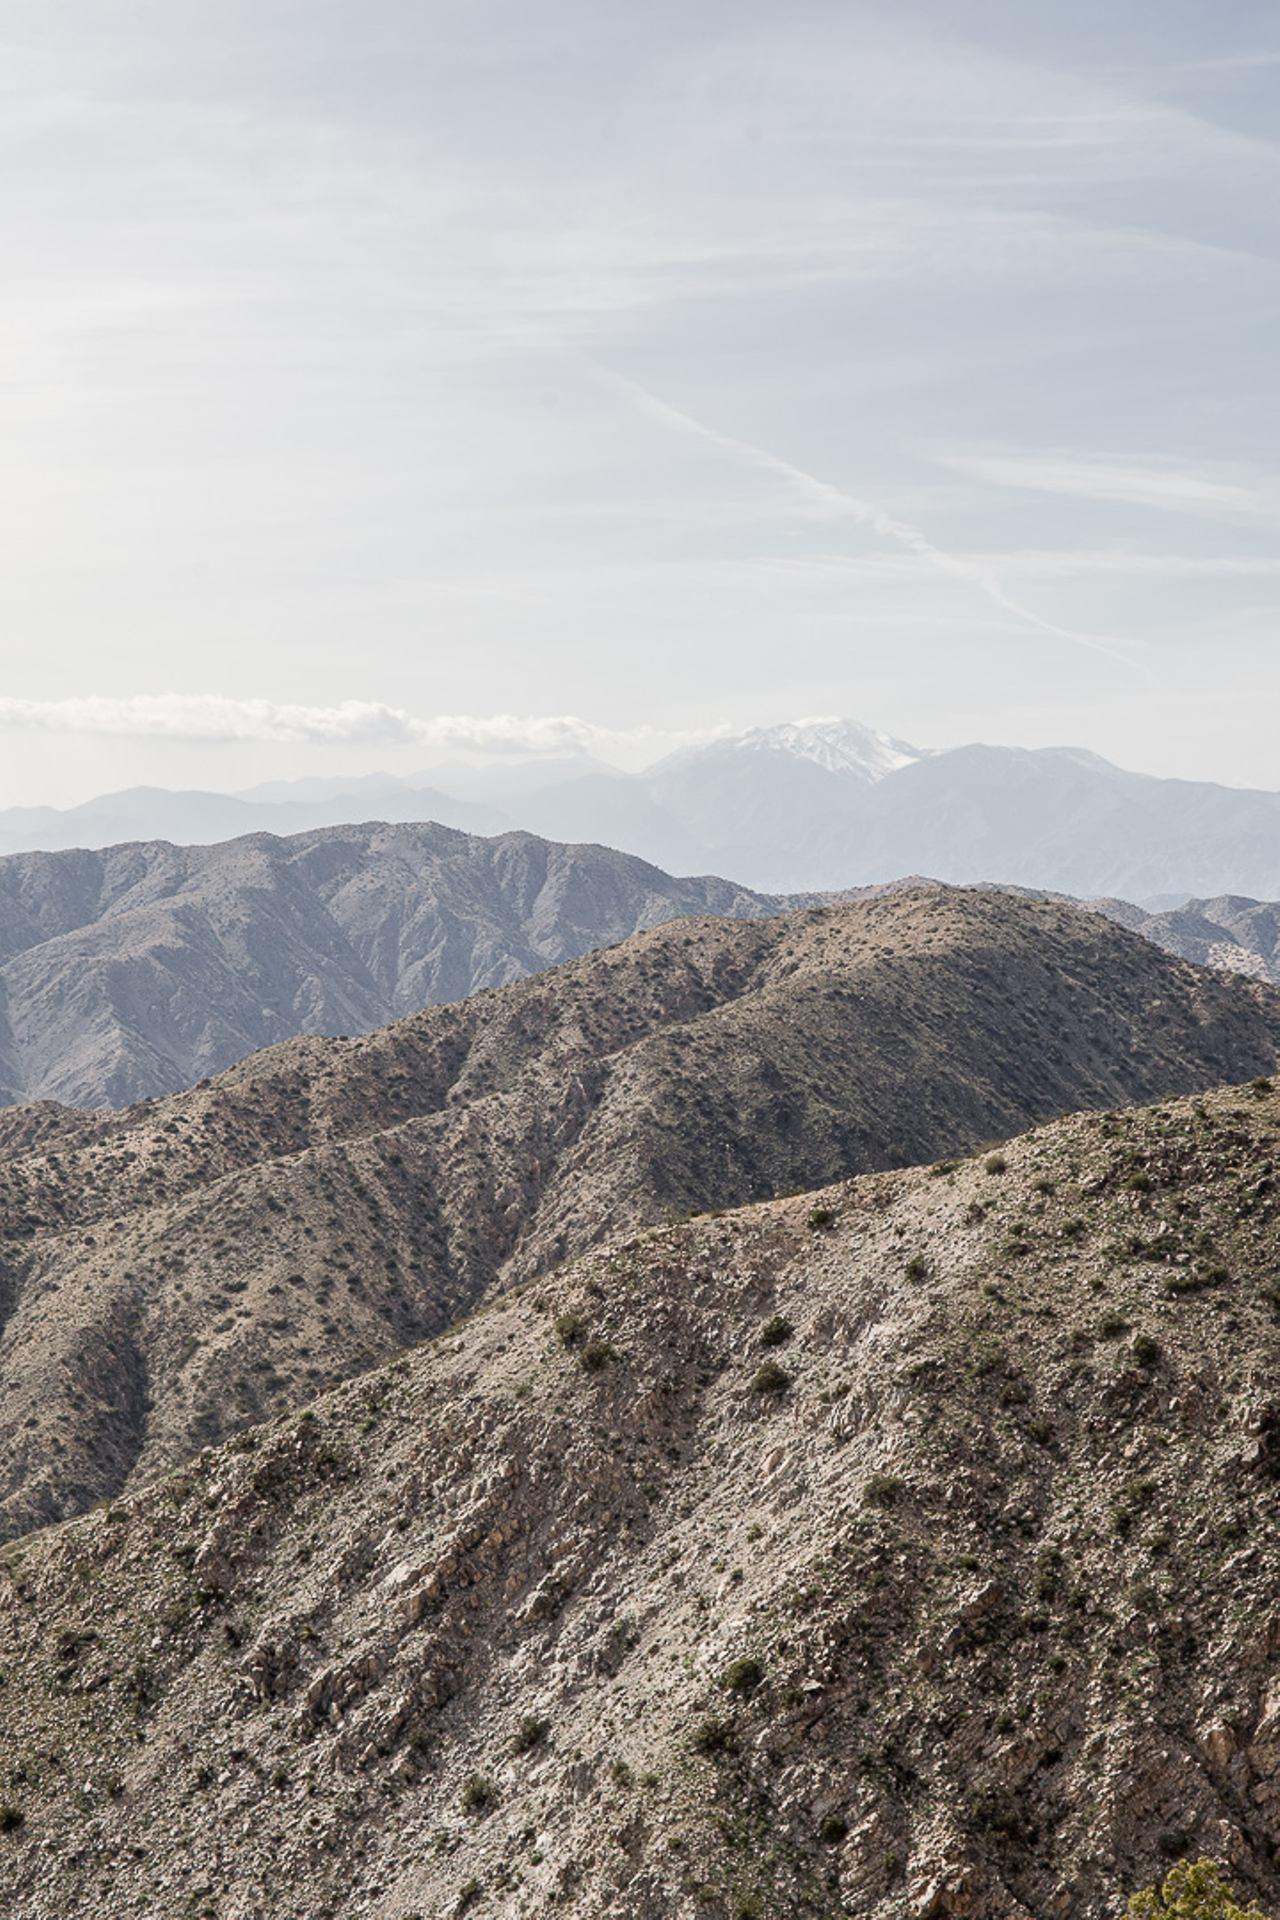 Coachella Valley mountains